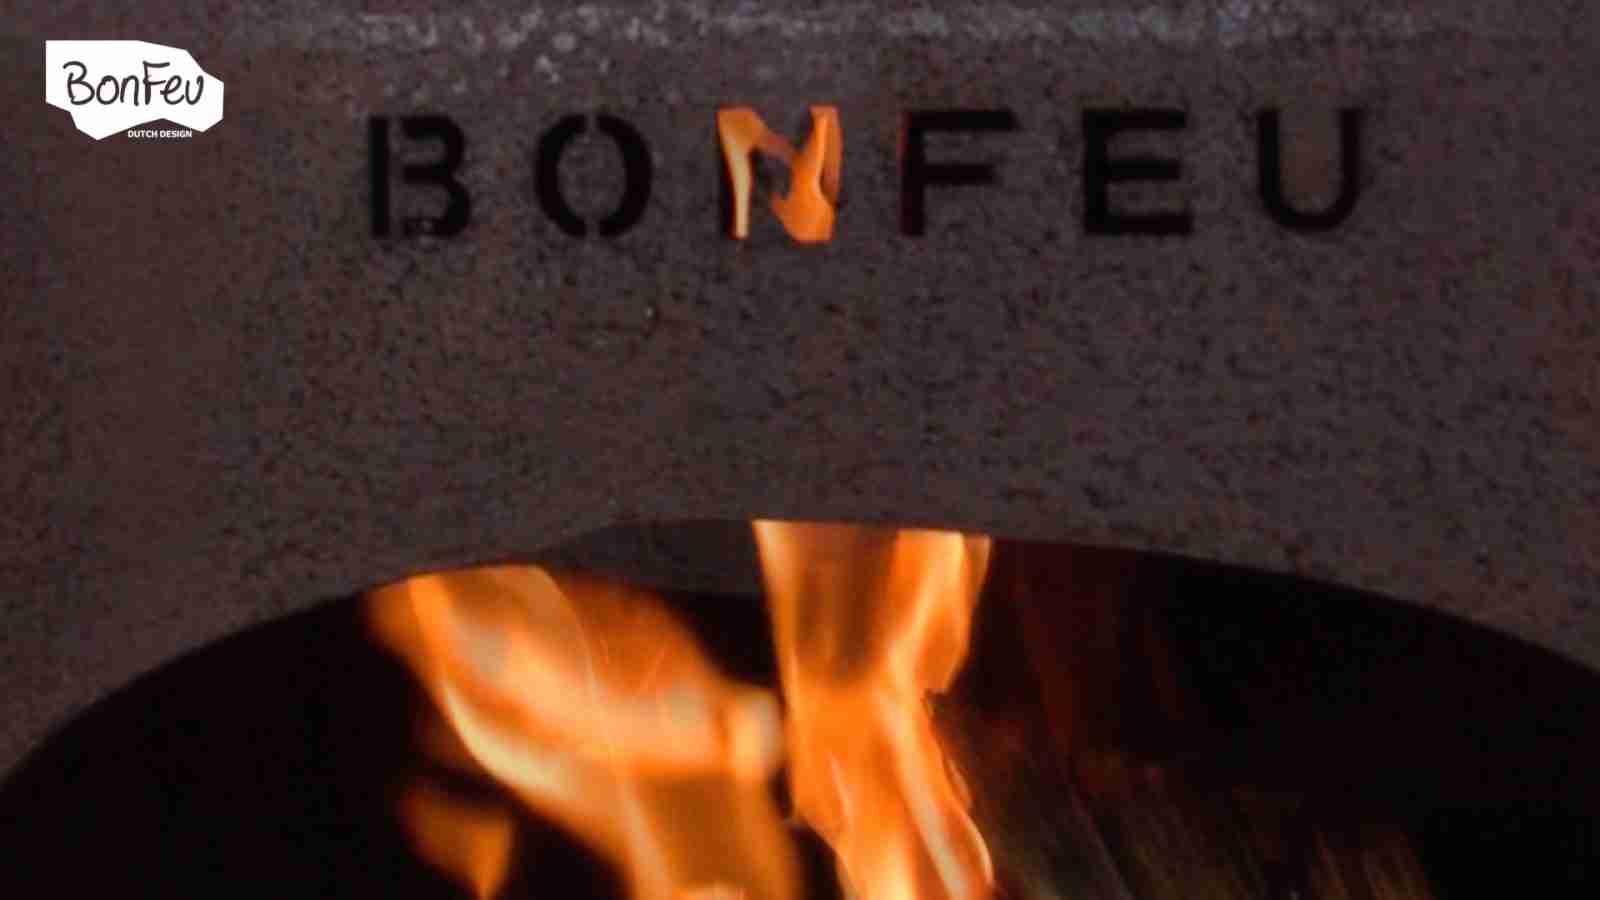 BonFeu-Tuinhaard-Bonbono-zwart-Zitteninjetuin-04